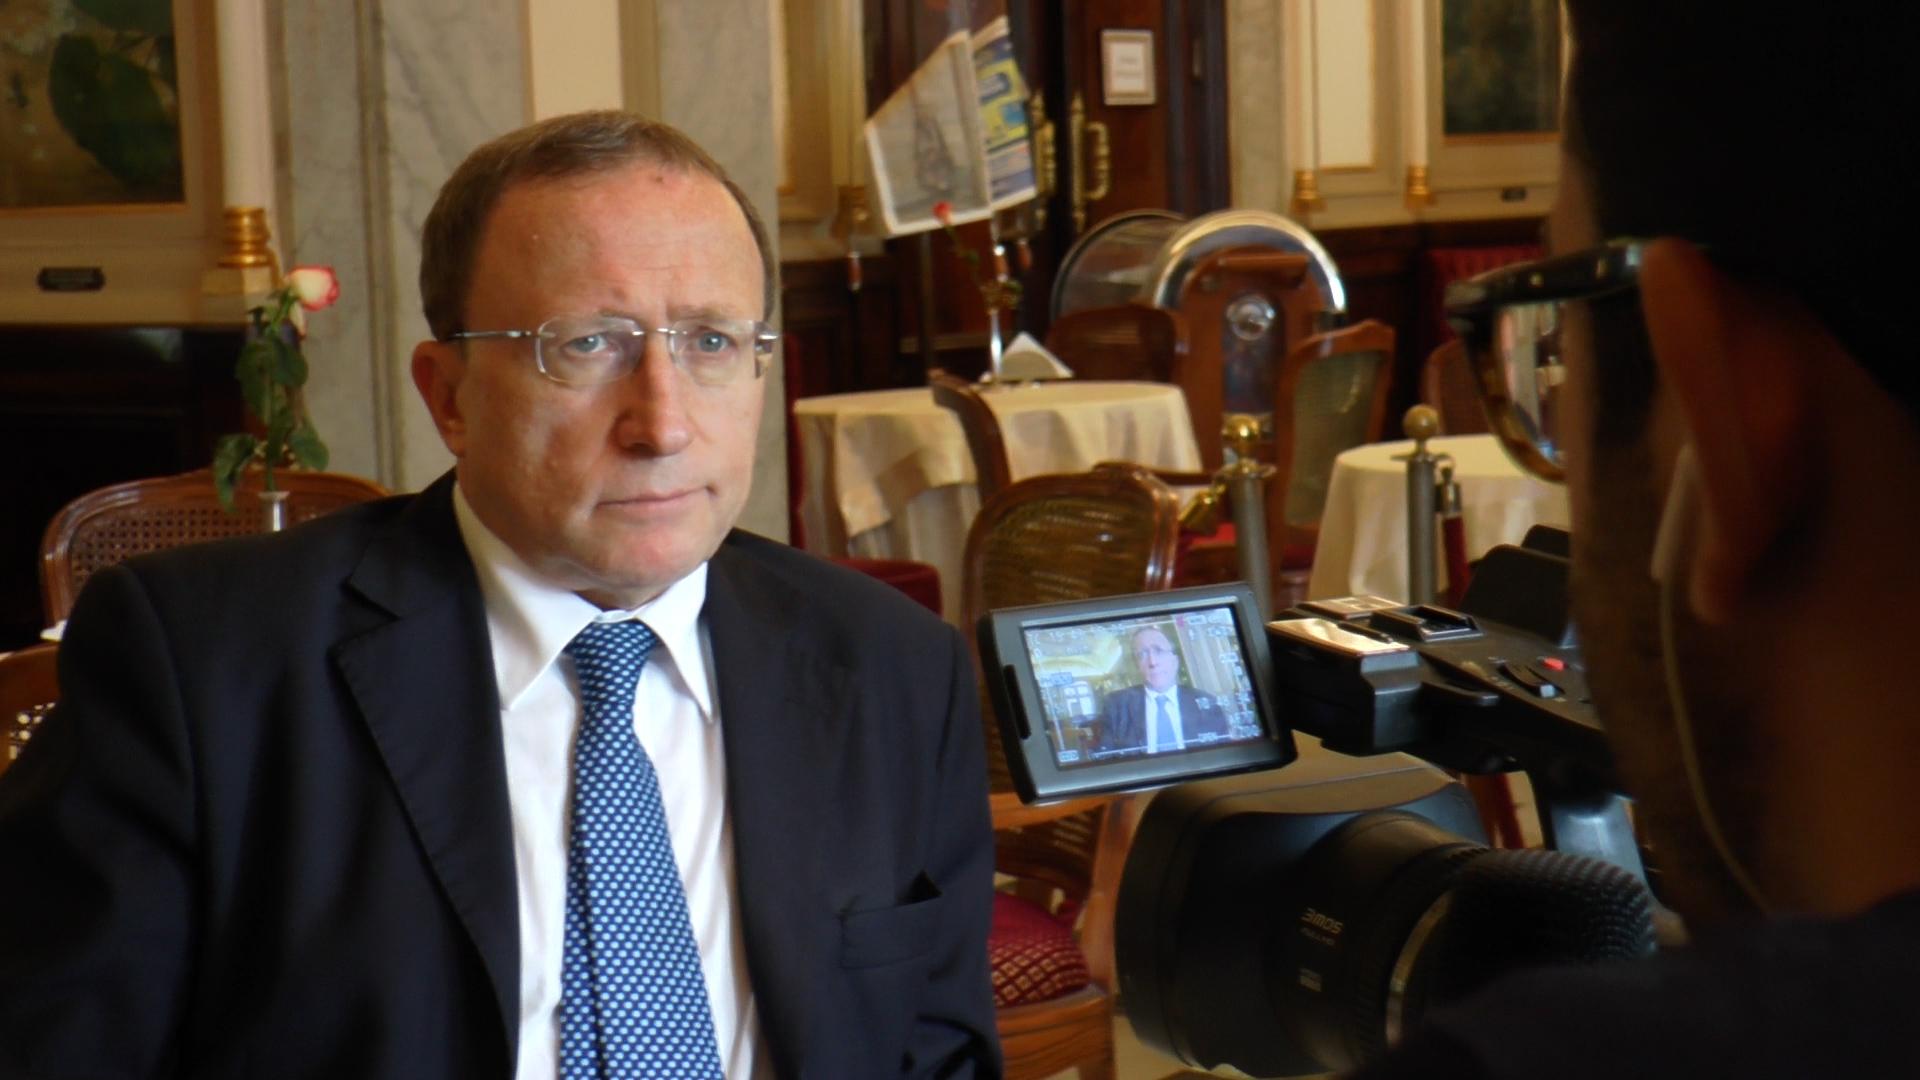 CAMPANIA E RIFIUTI: PARLA L'ASSESSORE REGIONALE BONAVITACOLA